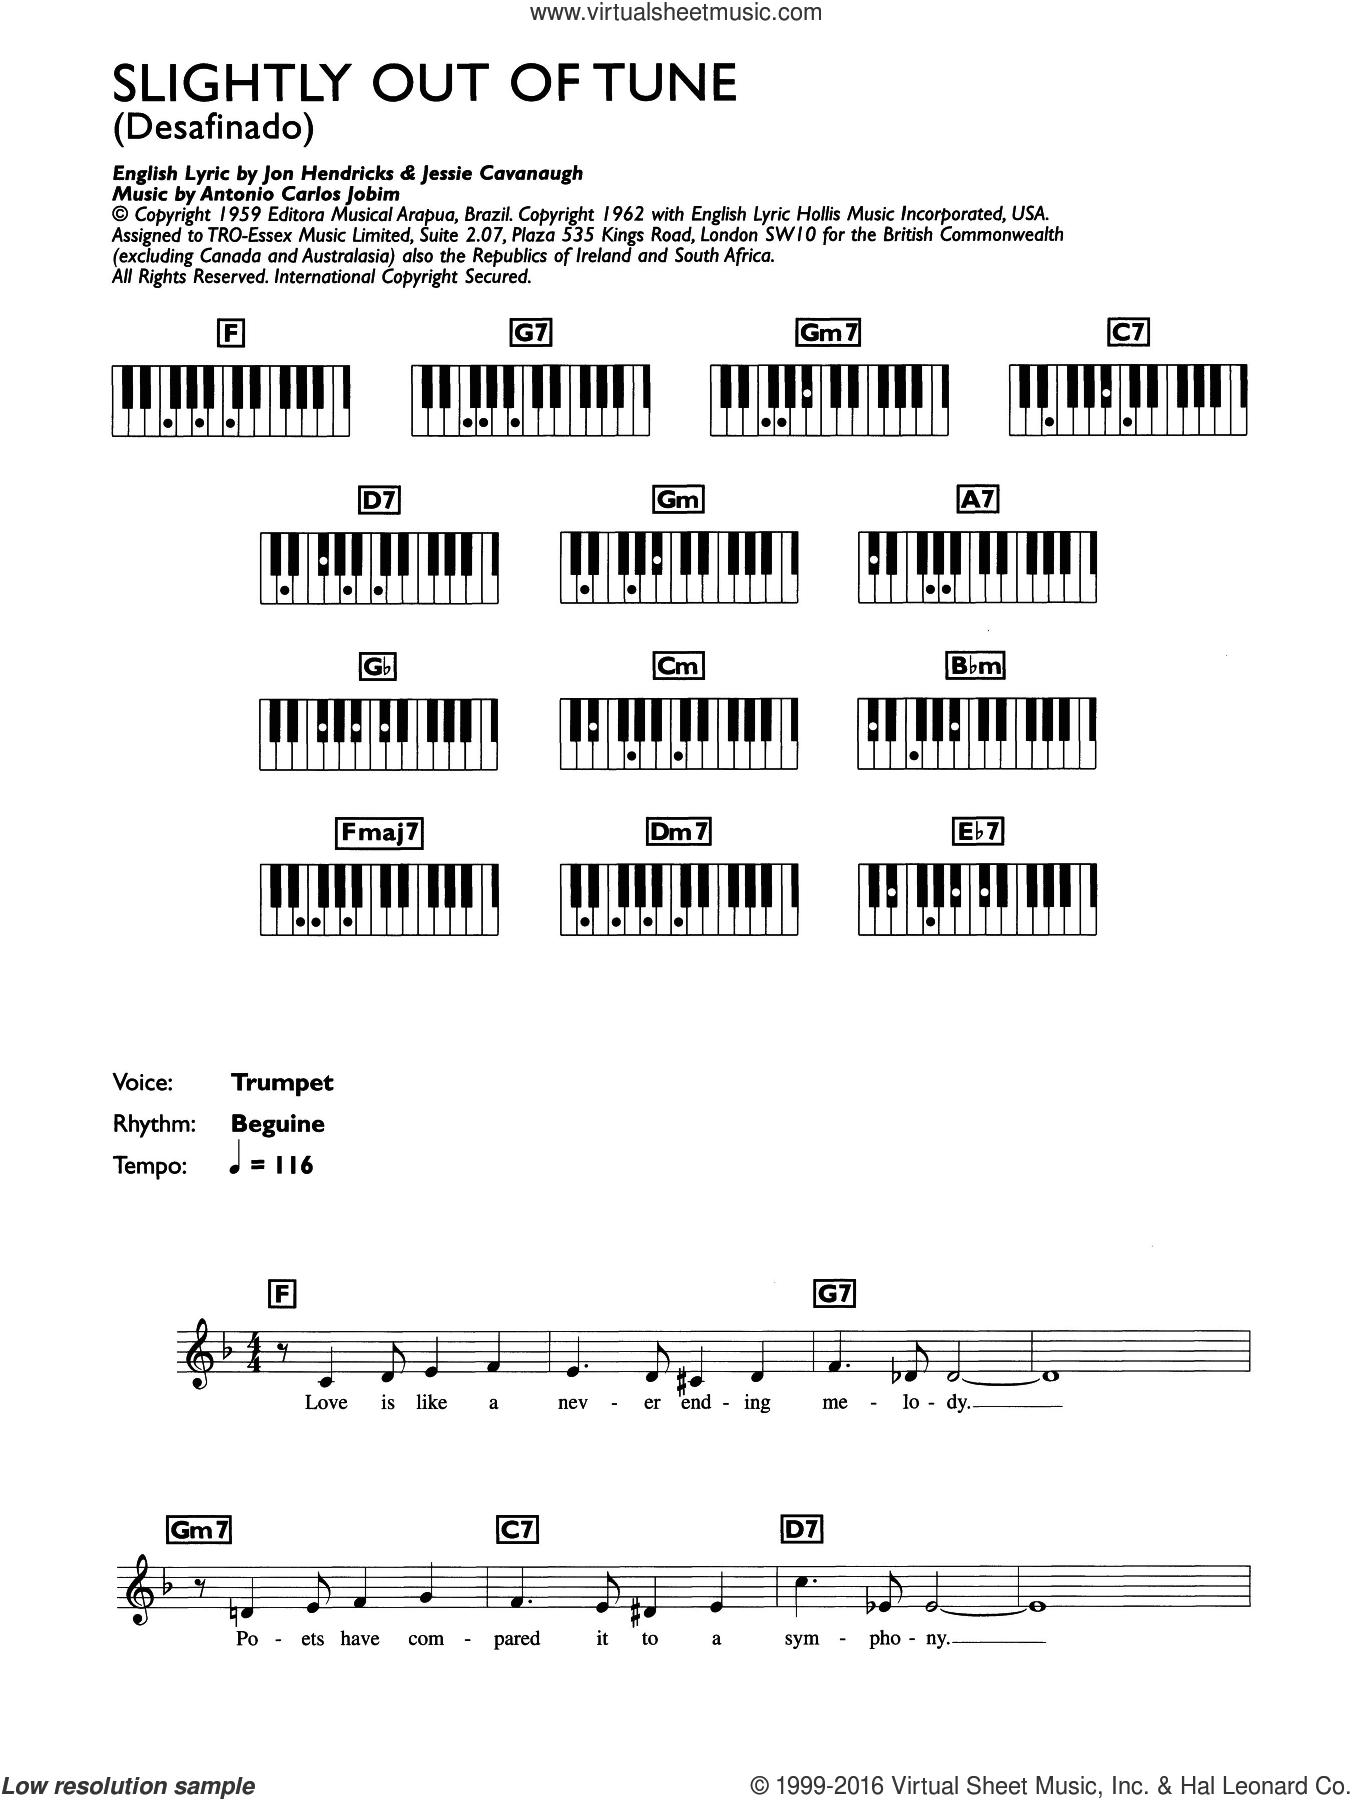 Desafinado (Slightly Out Of Tune) sheet music for piano solo (chords, lyrics, melody) by Antonio Carlos Jobim, Jessie Cavanaugh, Jon Hendricks and Newton Mendonca, intermediate piano (chords, lyrics, melody)